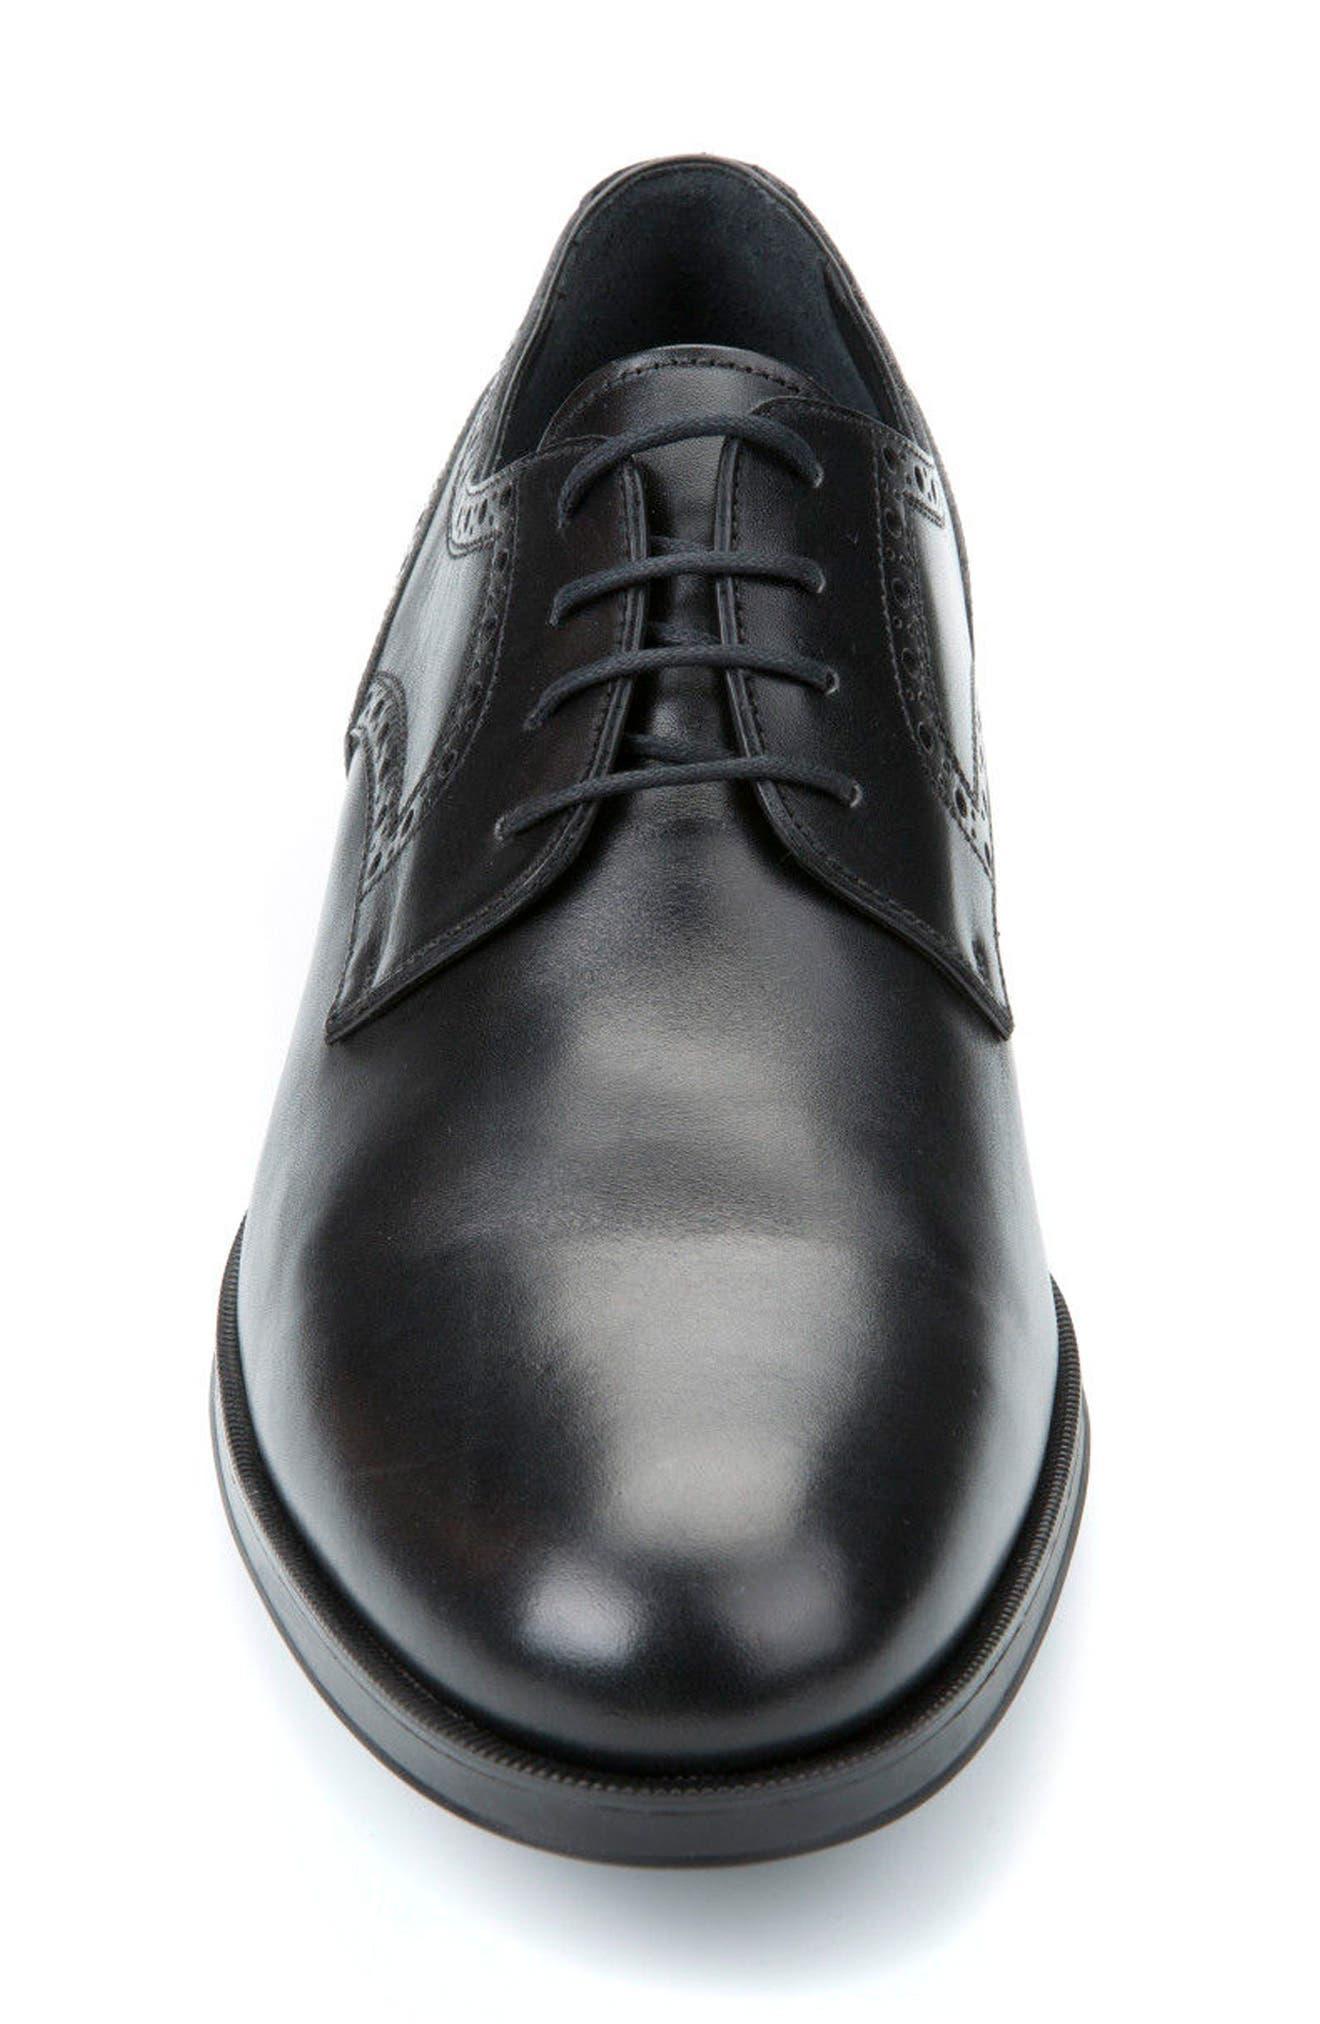 GEOX, Hilstone 3 Plain Toe Derby, Alternate thumbnail 4, color, BLACK LEATHER